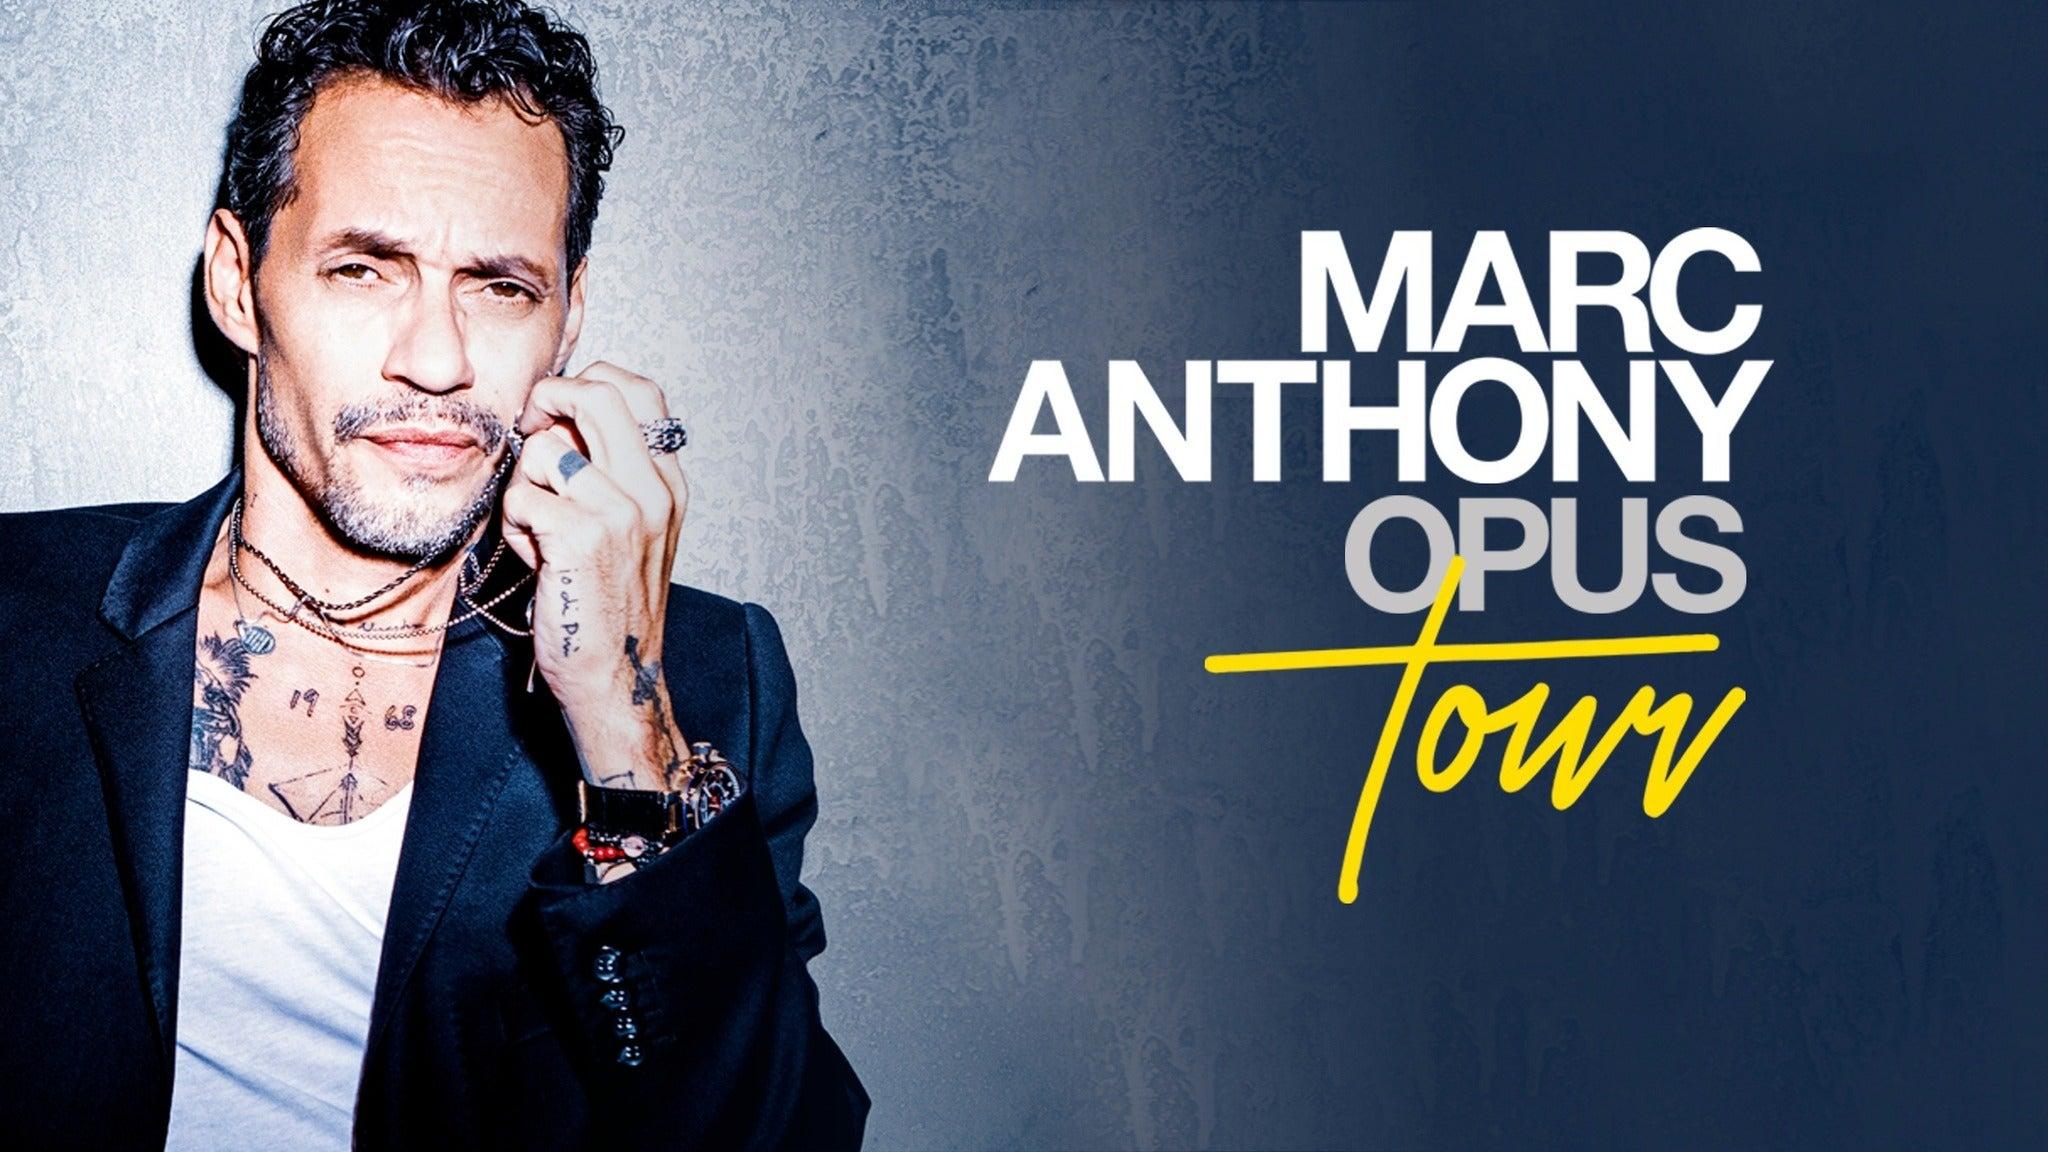 Marc Anthony Opus Tour Dates 2021 Calendar